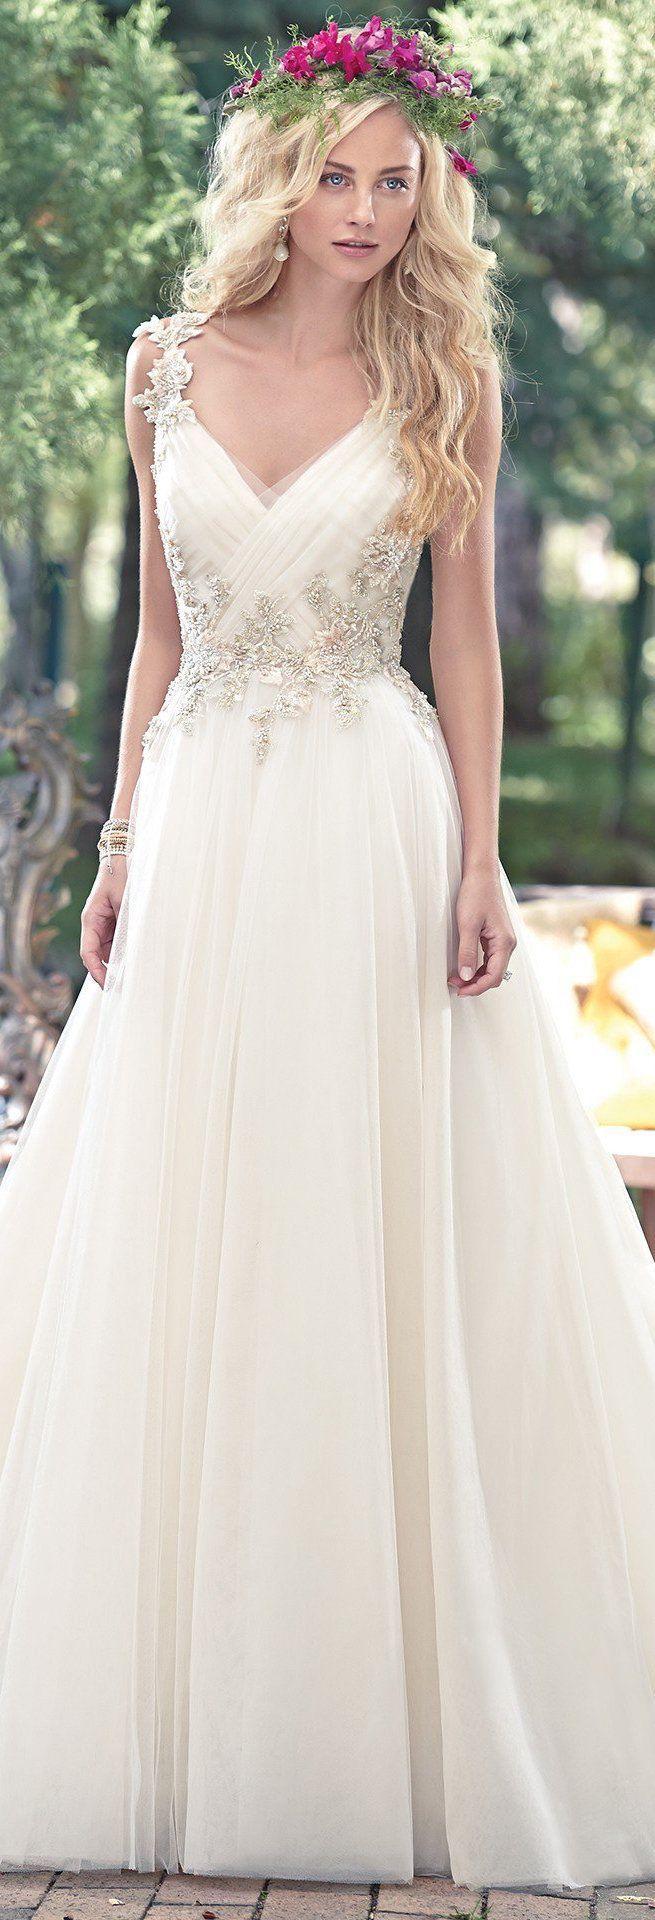 Jcpenney wedding dresses plus size   best cocktail dresses images on Pinterest  Ballroom dress